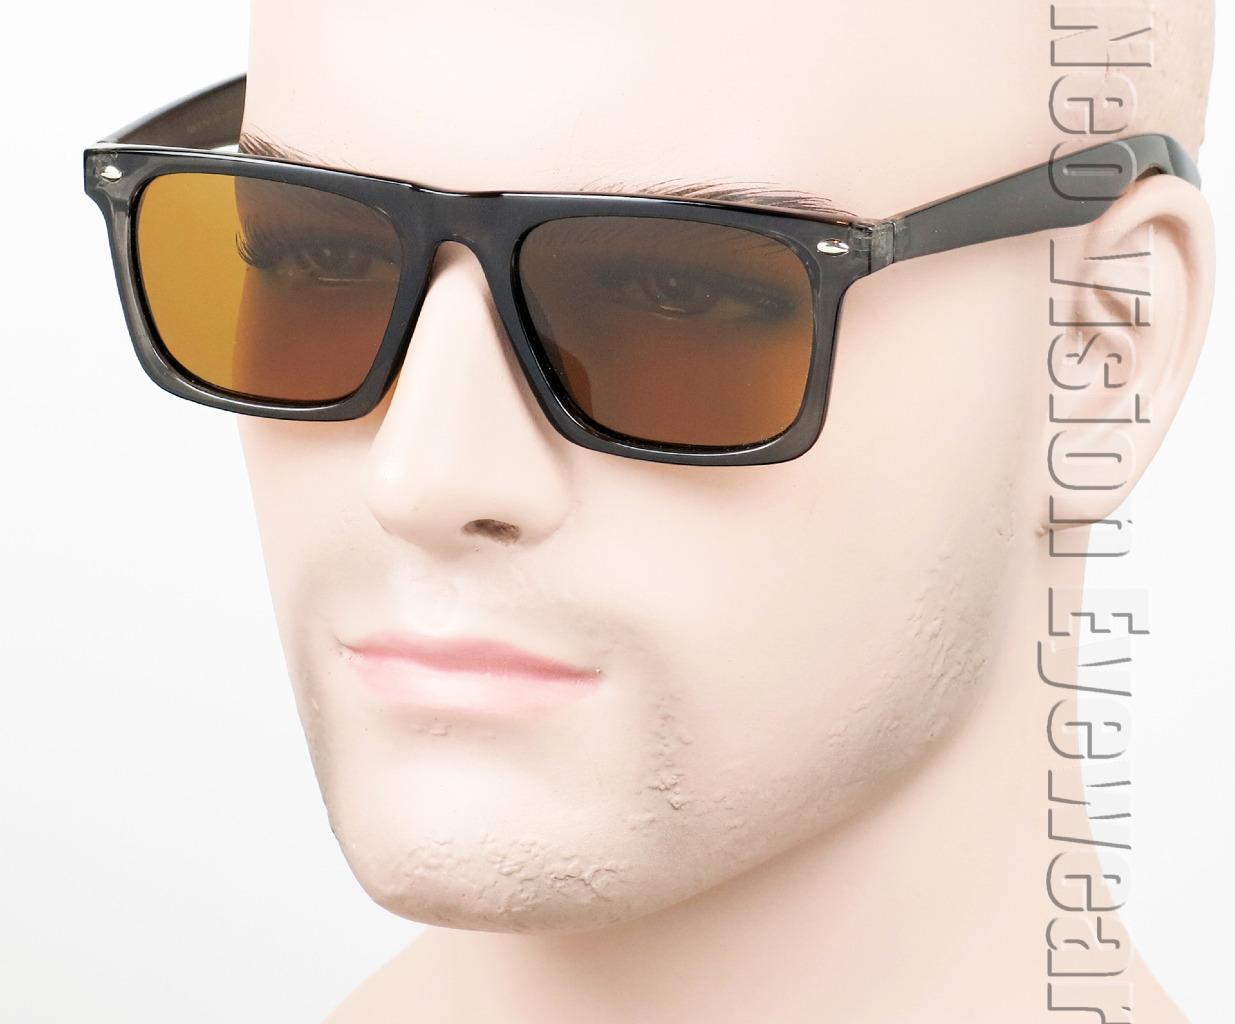 48a923bece2 Wayfarers Sunglasses Meaning